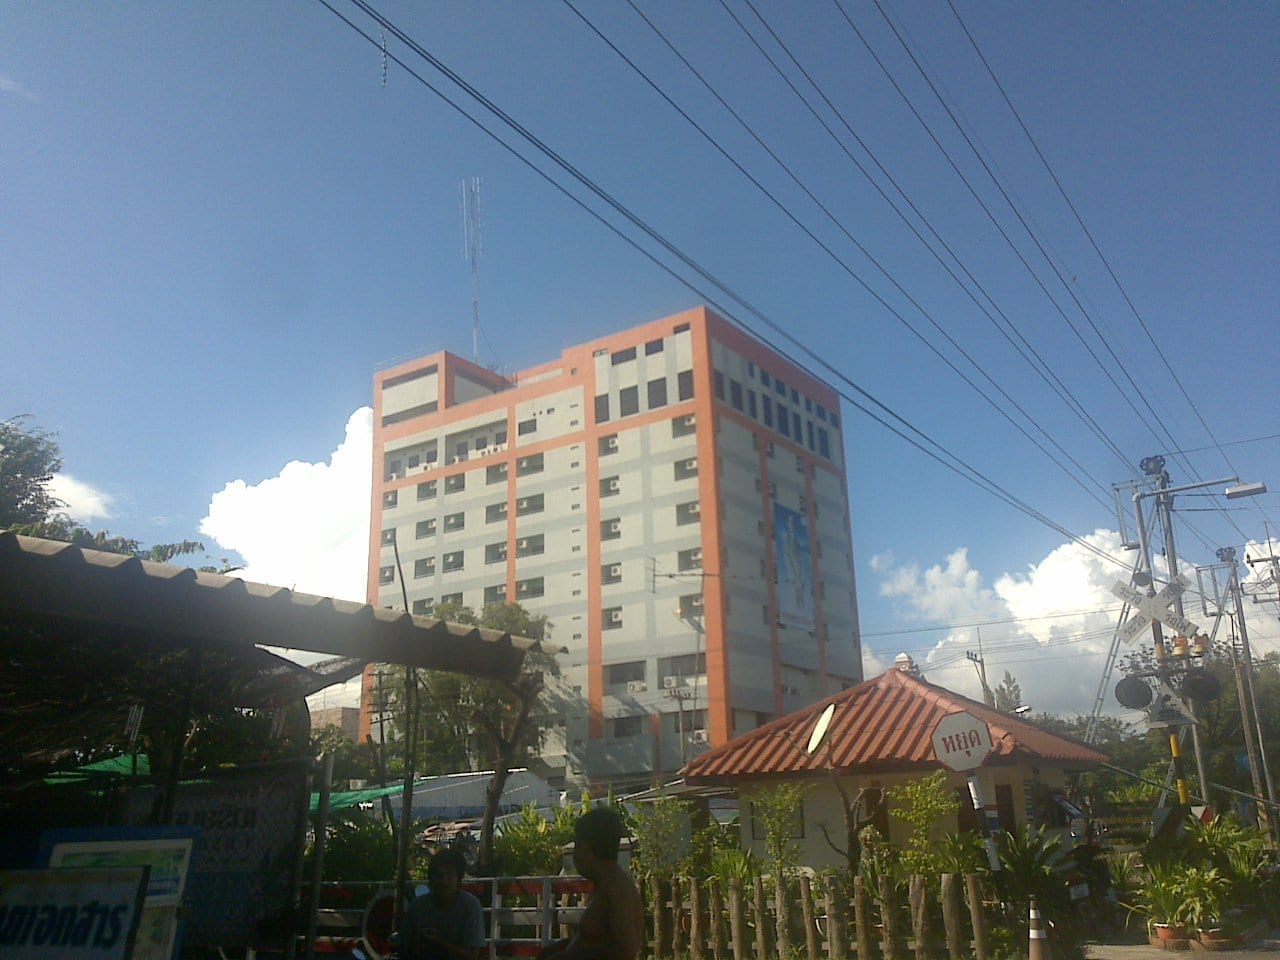 Centro de educación médica, Hospital General de Buriram. Buriram Tailandia